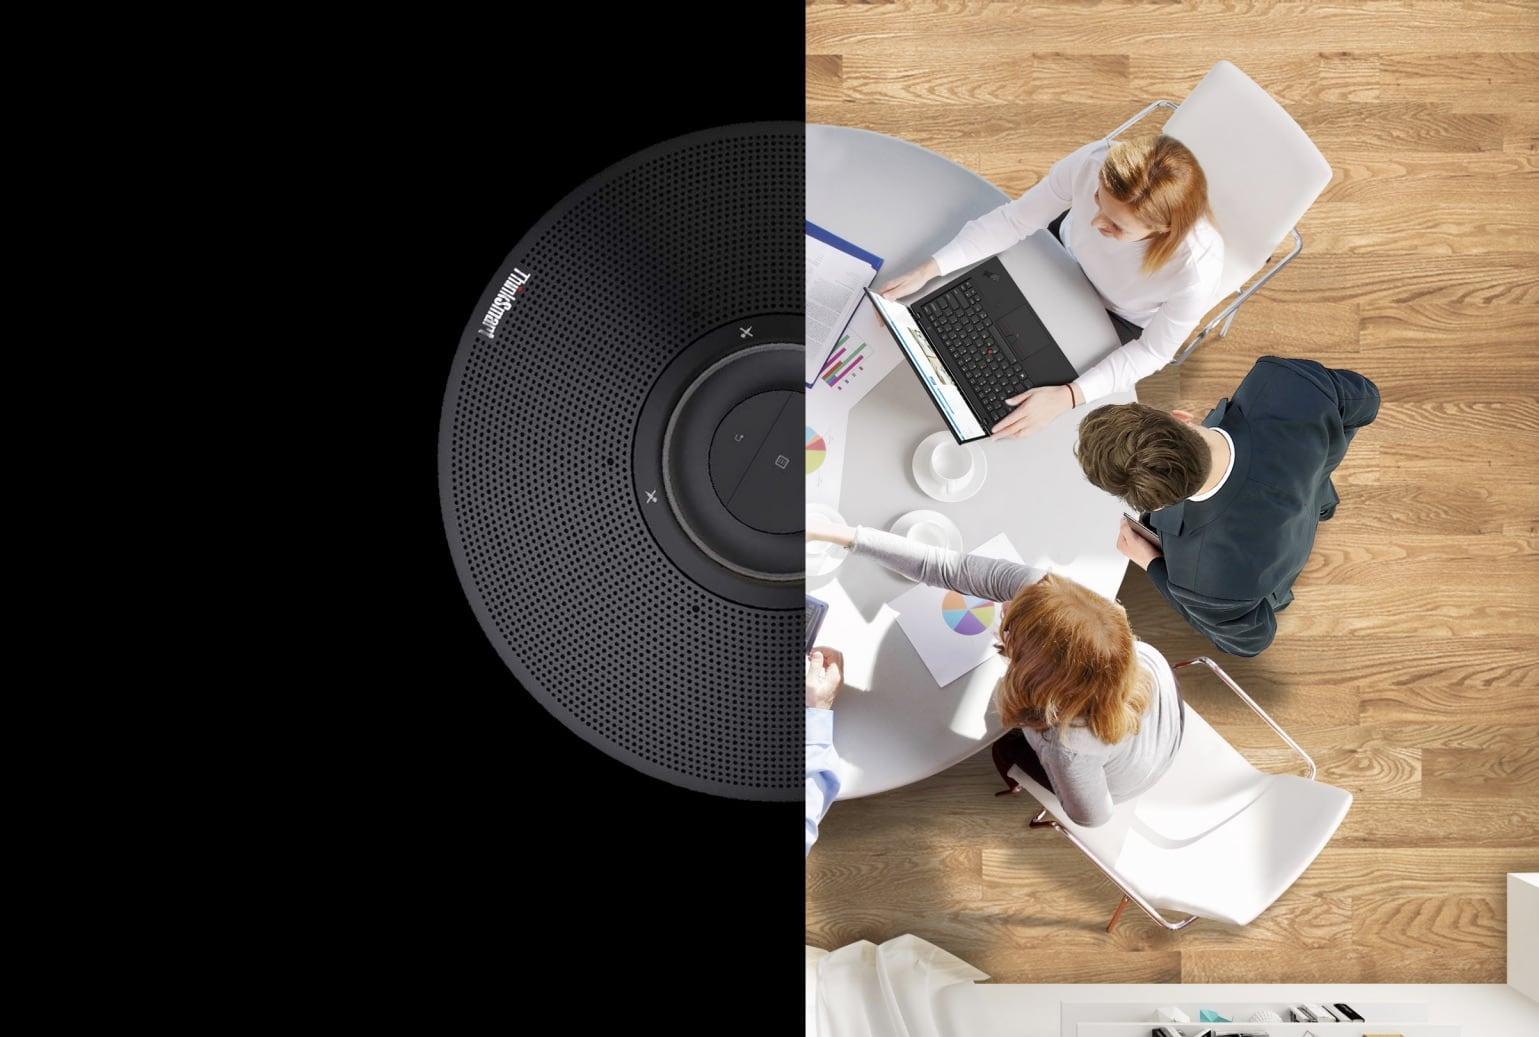 Lenovo ThinkSmart Hub 700 Smart Collaboration Device